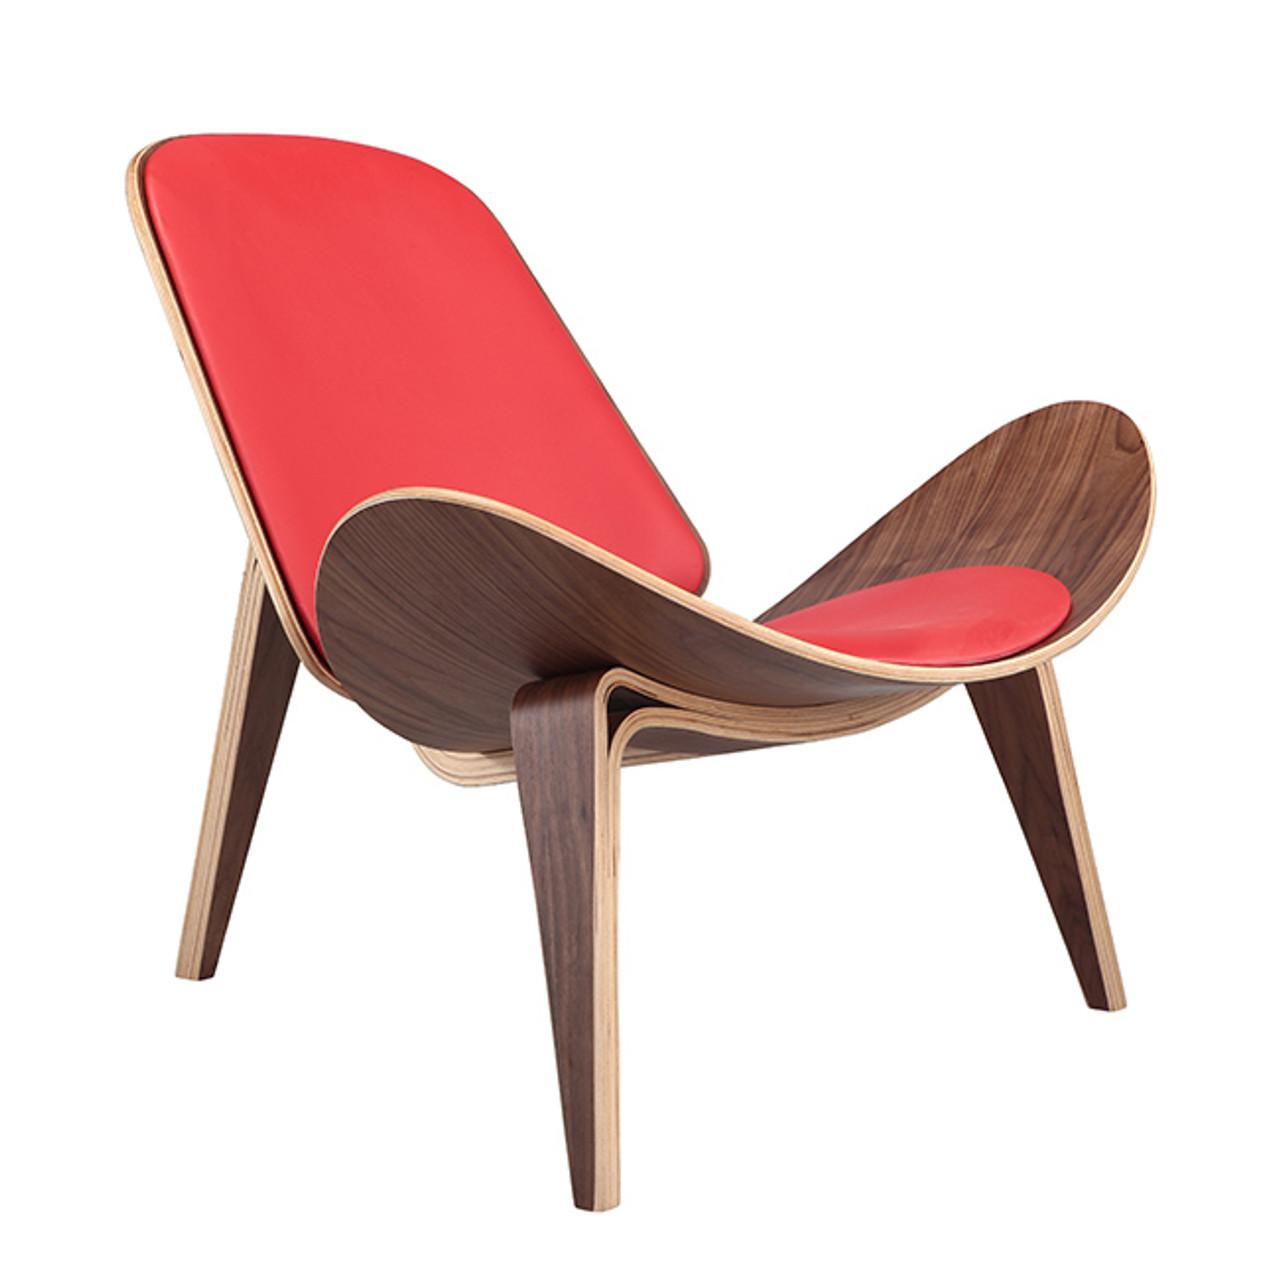 Orange shell chair